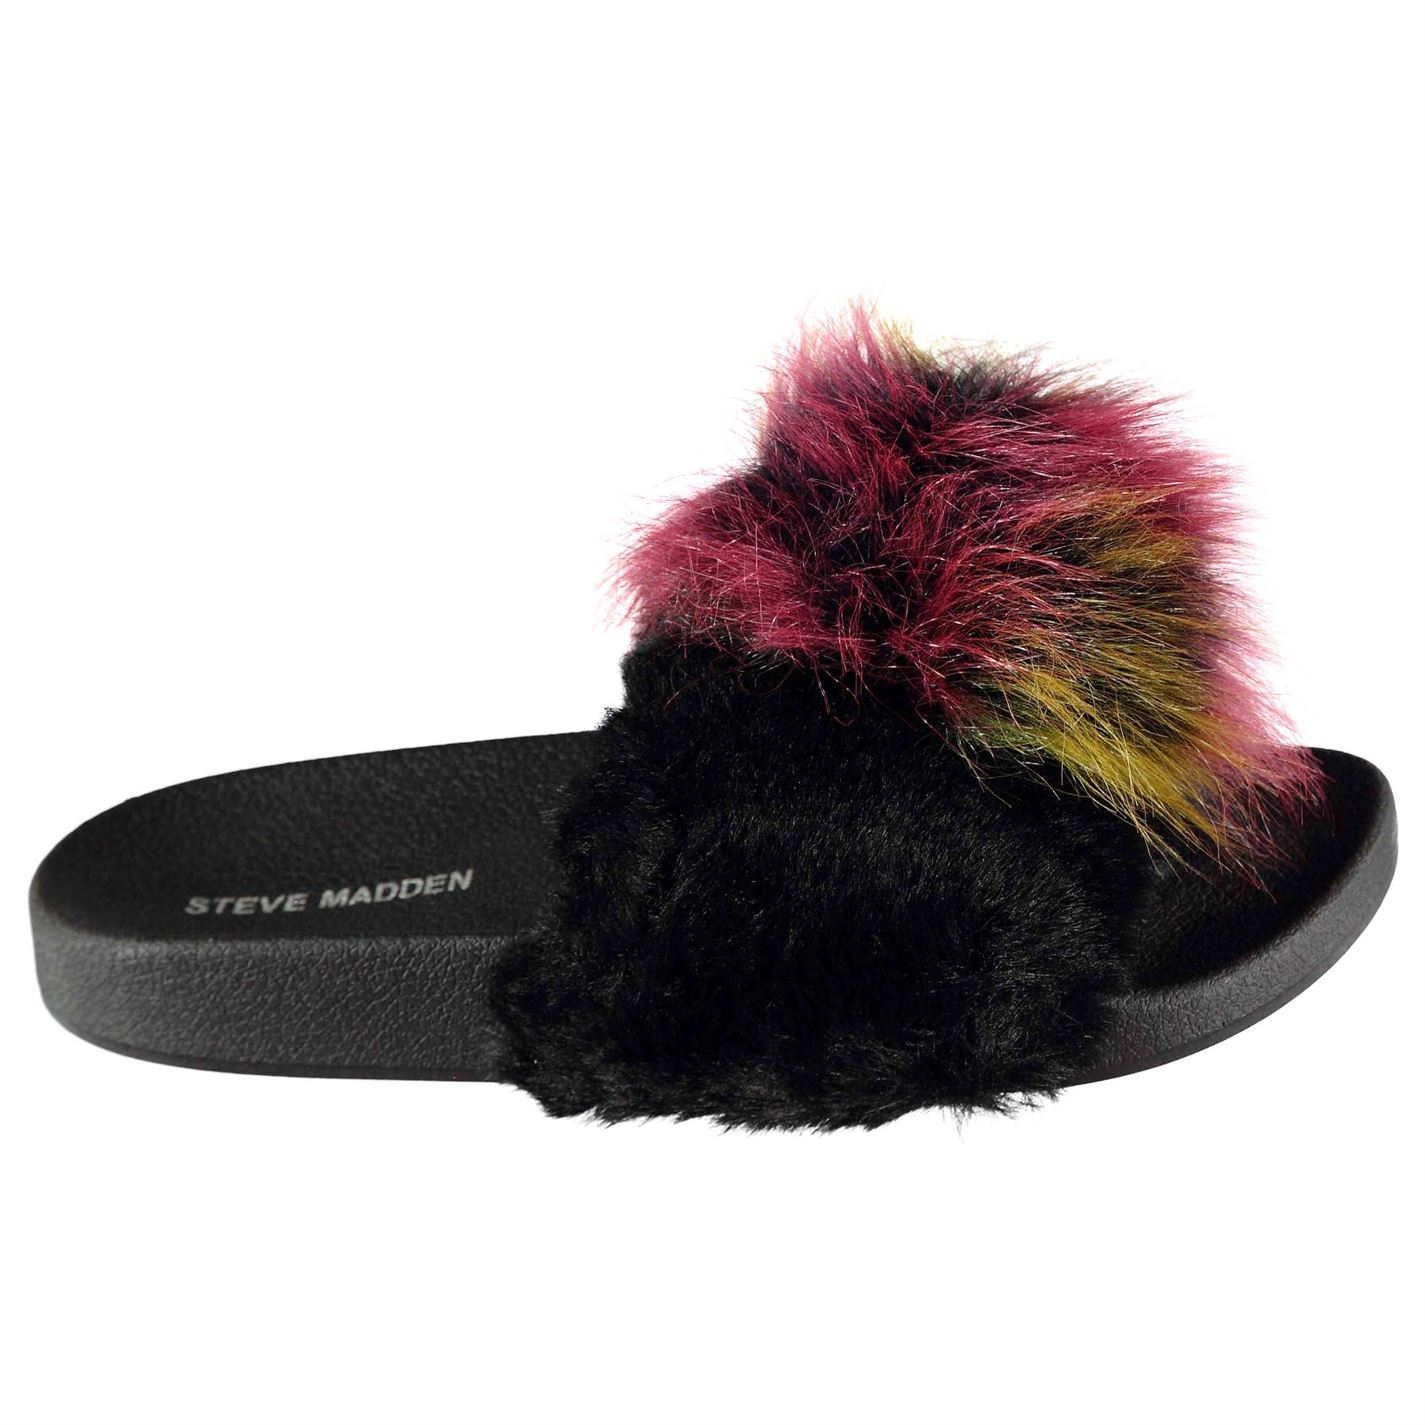 c6584729355 Details about Womens Steve Madden Fur Mule Sliders Flip Flops Slip On  Textured New